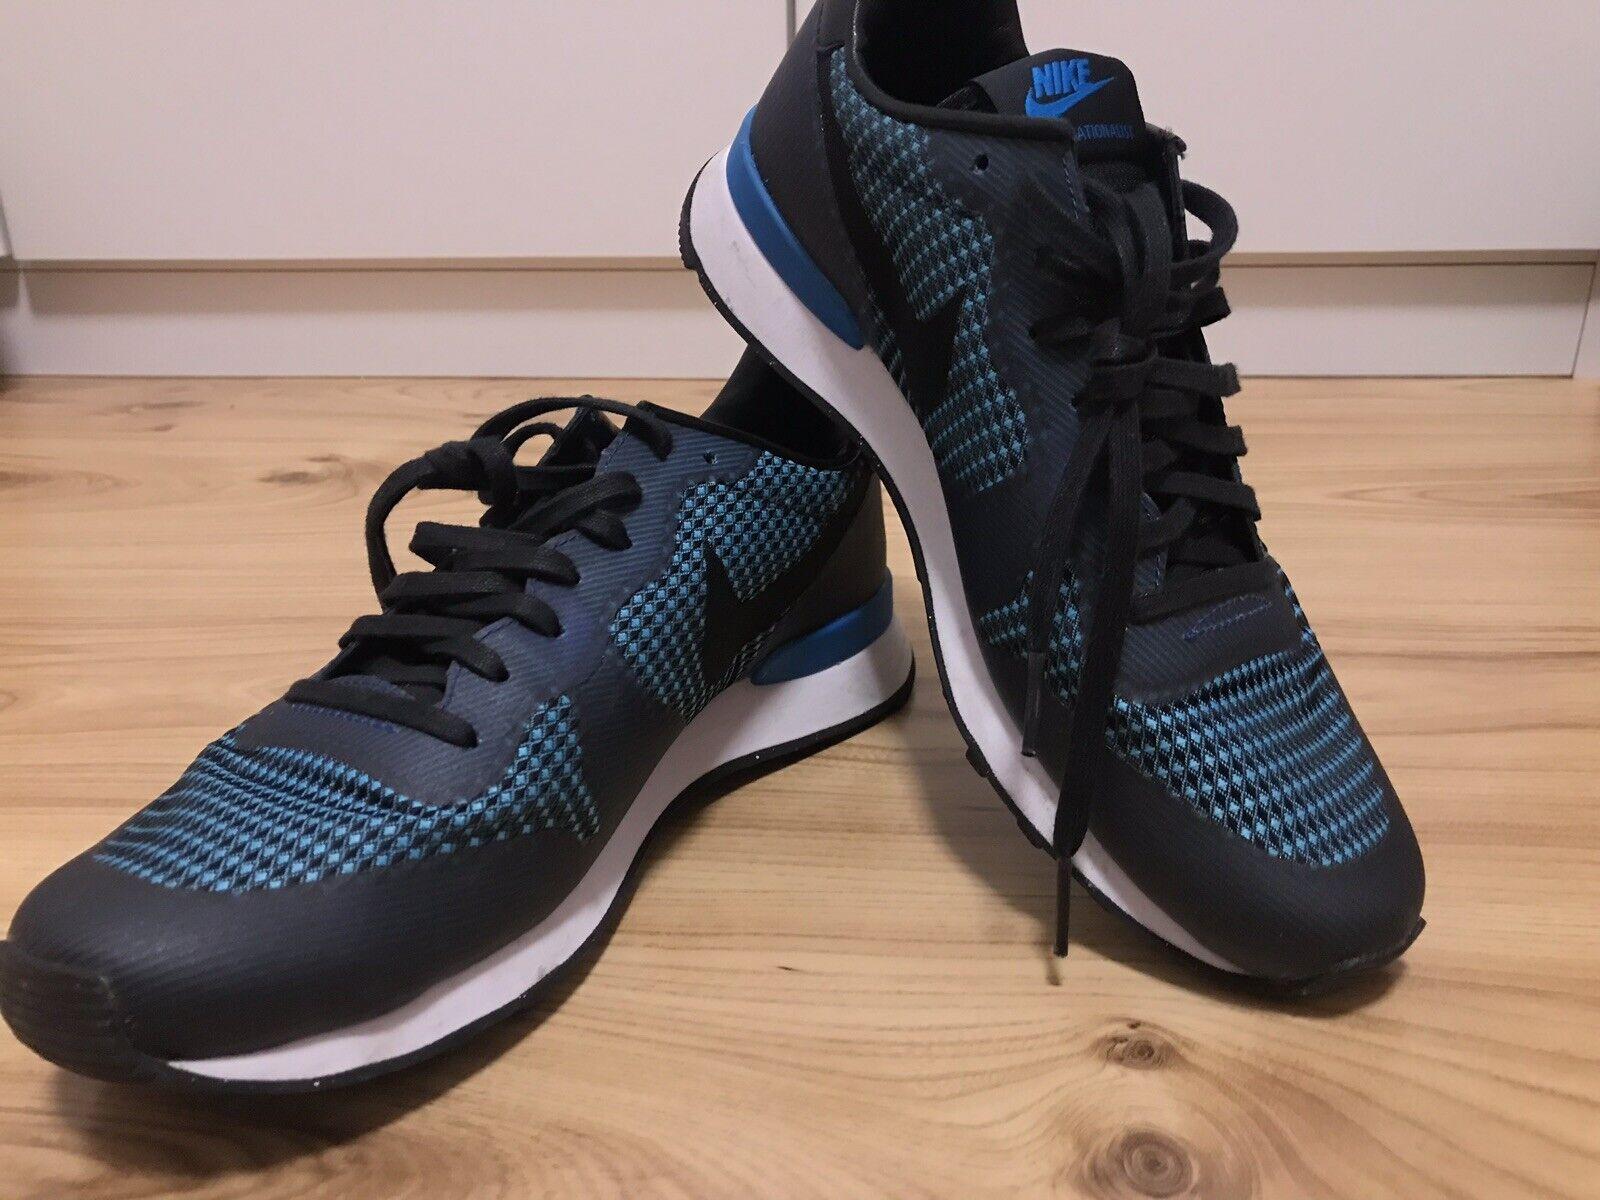 Nike Internationalist Schuhe Turnschuhe in dunkelblau. Größe